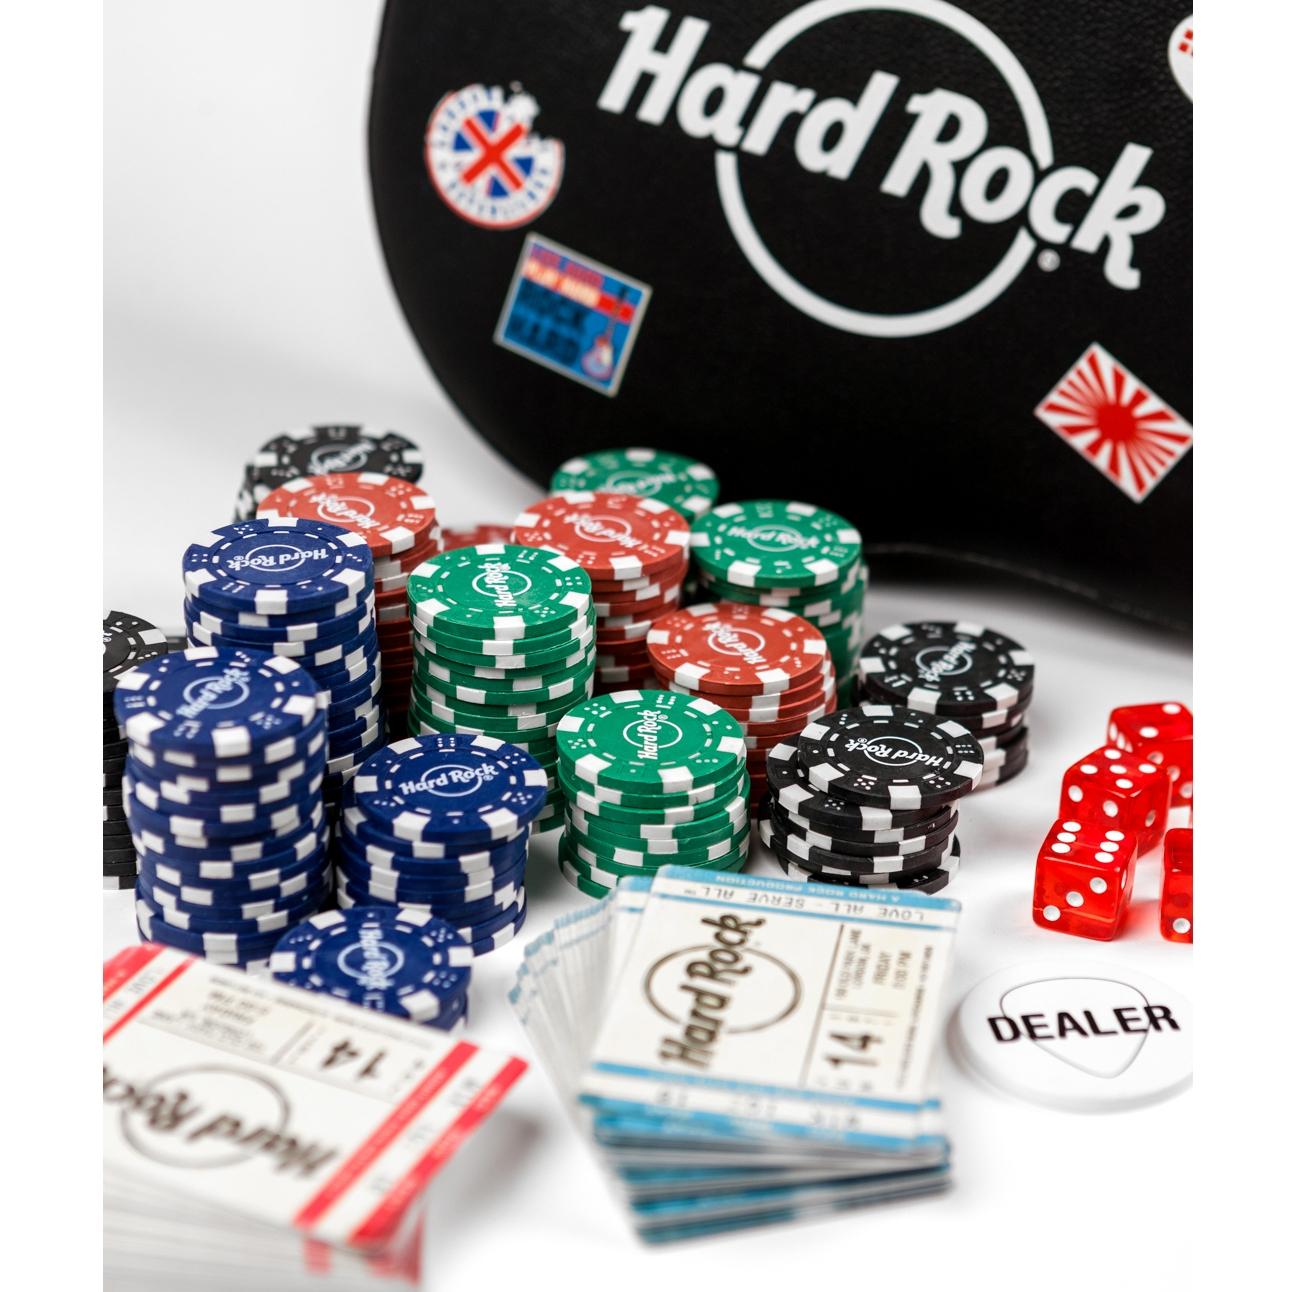 Guitar Case Poker Set 2